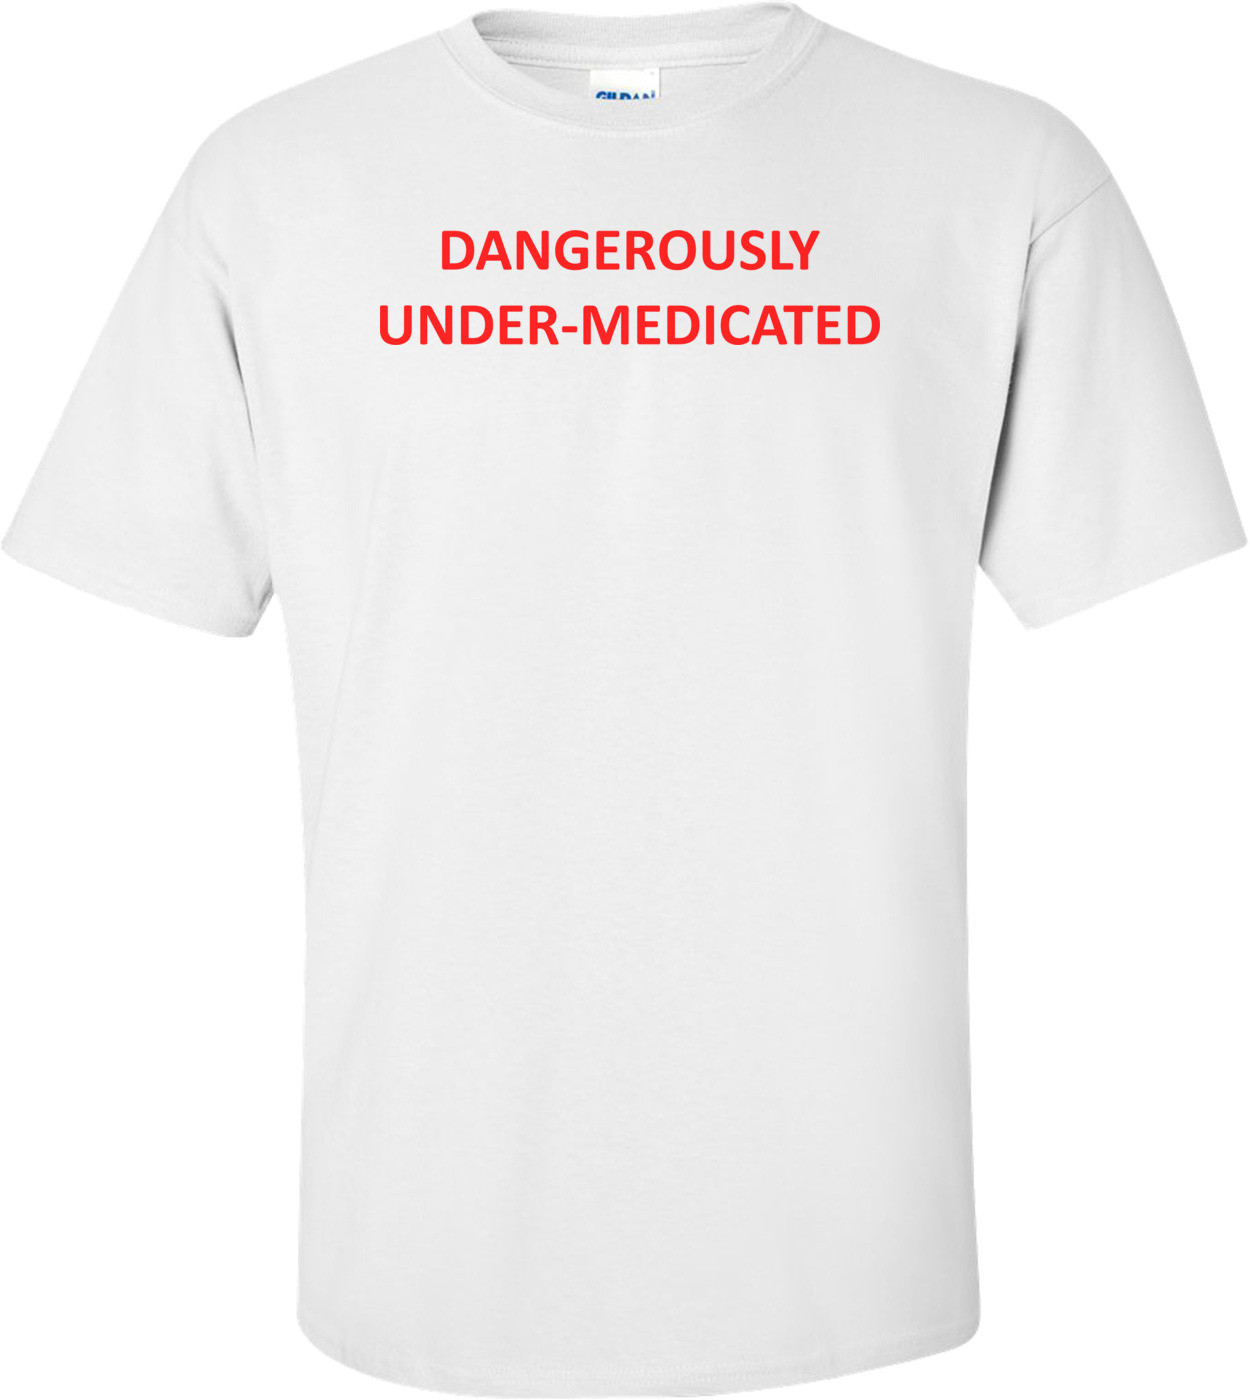 DANGEROUSLY UNDER-MEDICATED Shirt